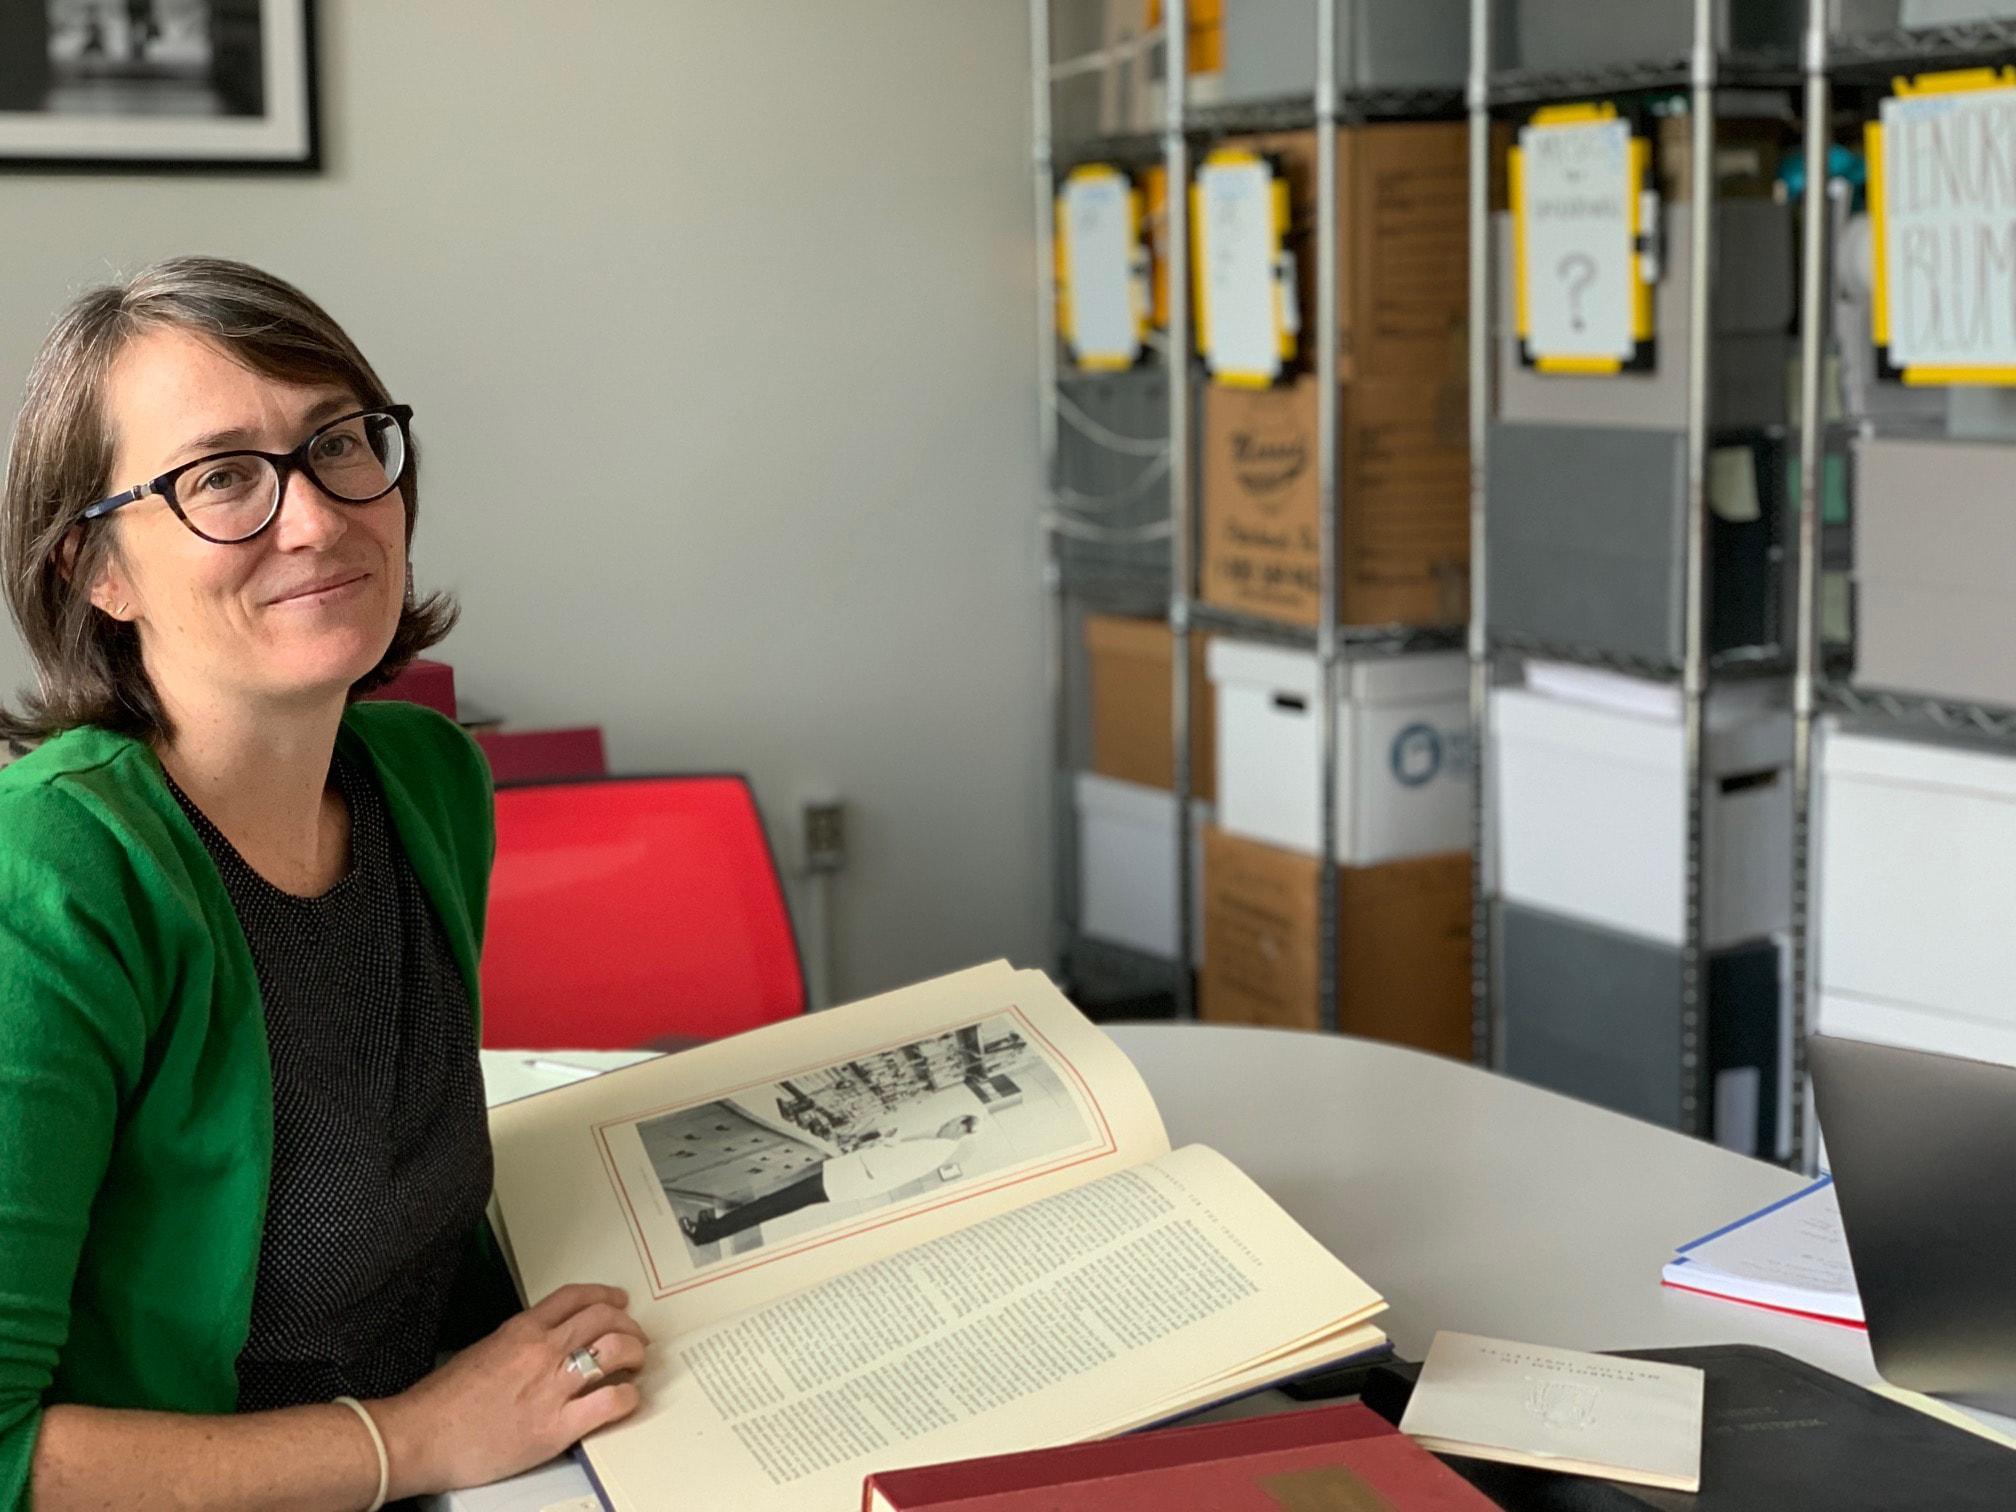 Archivist Emily Davis